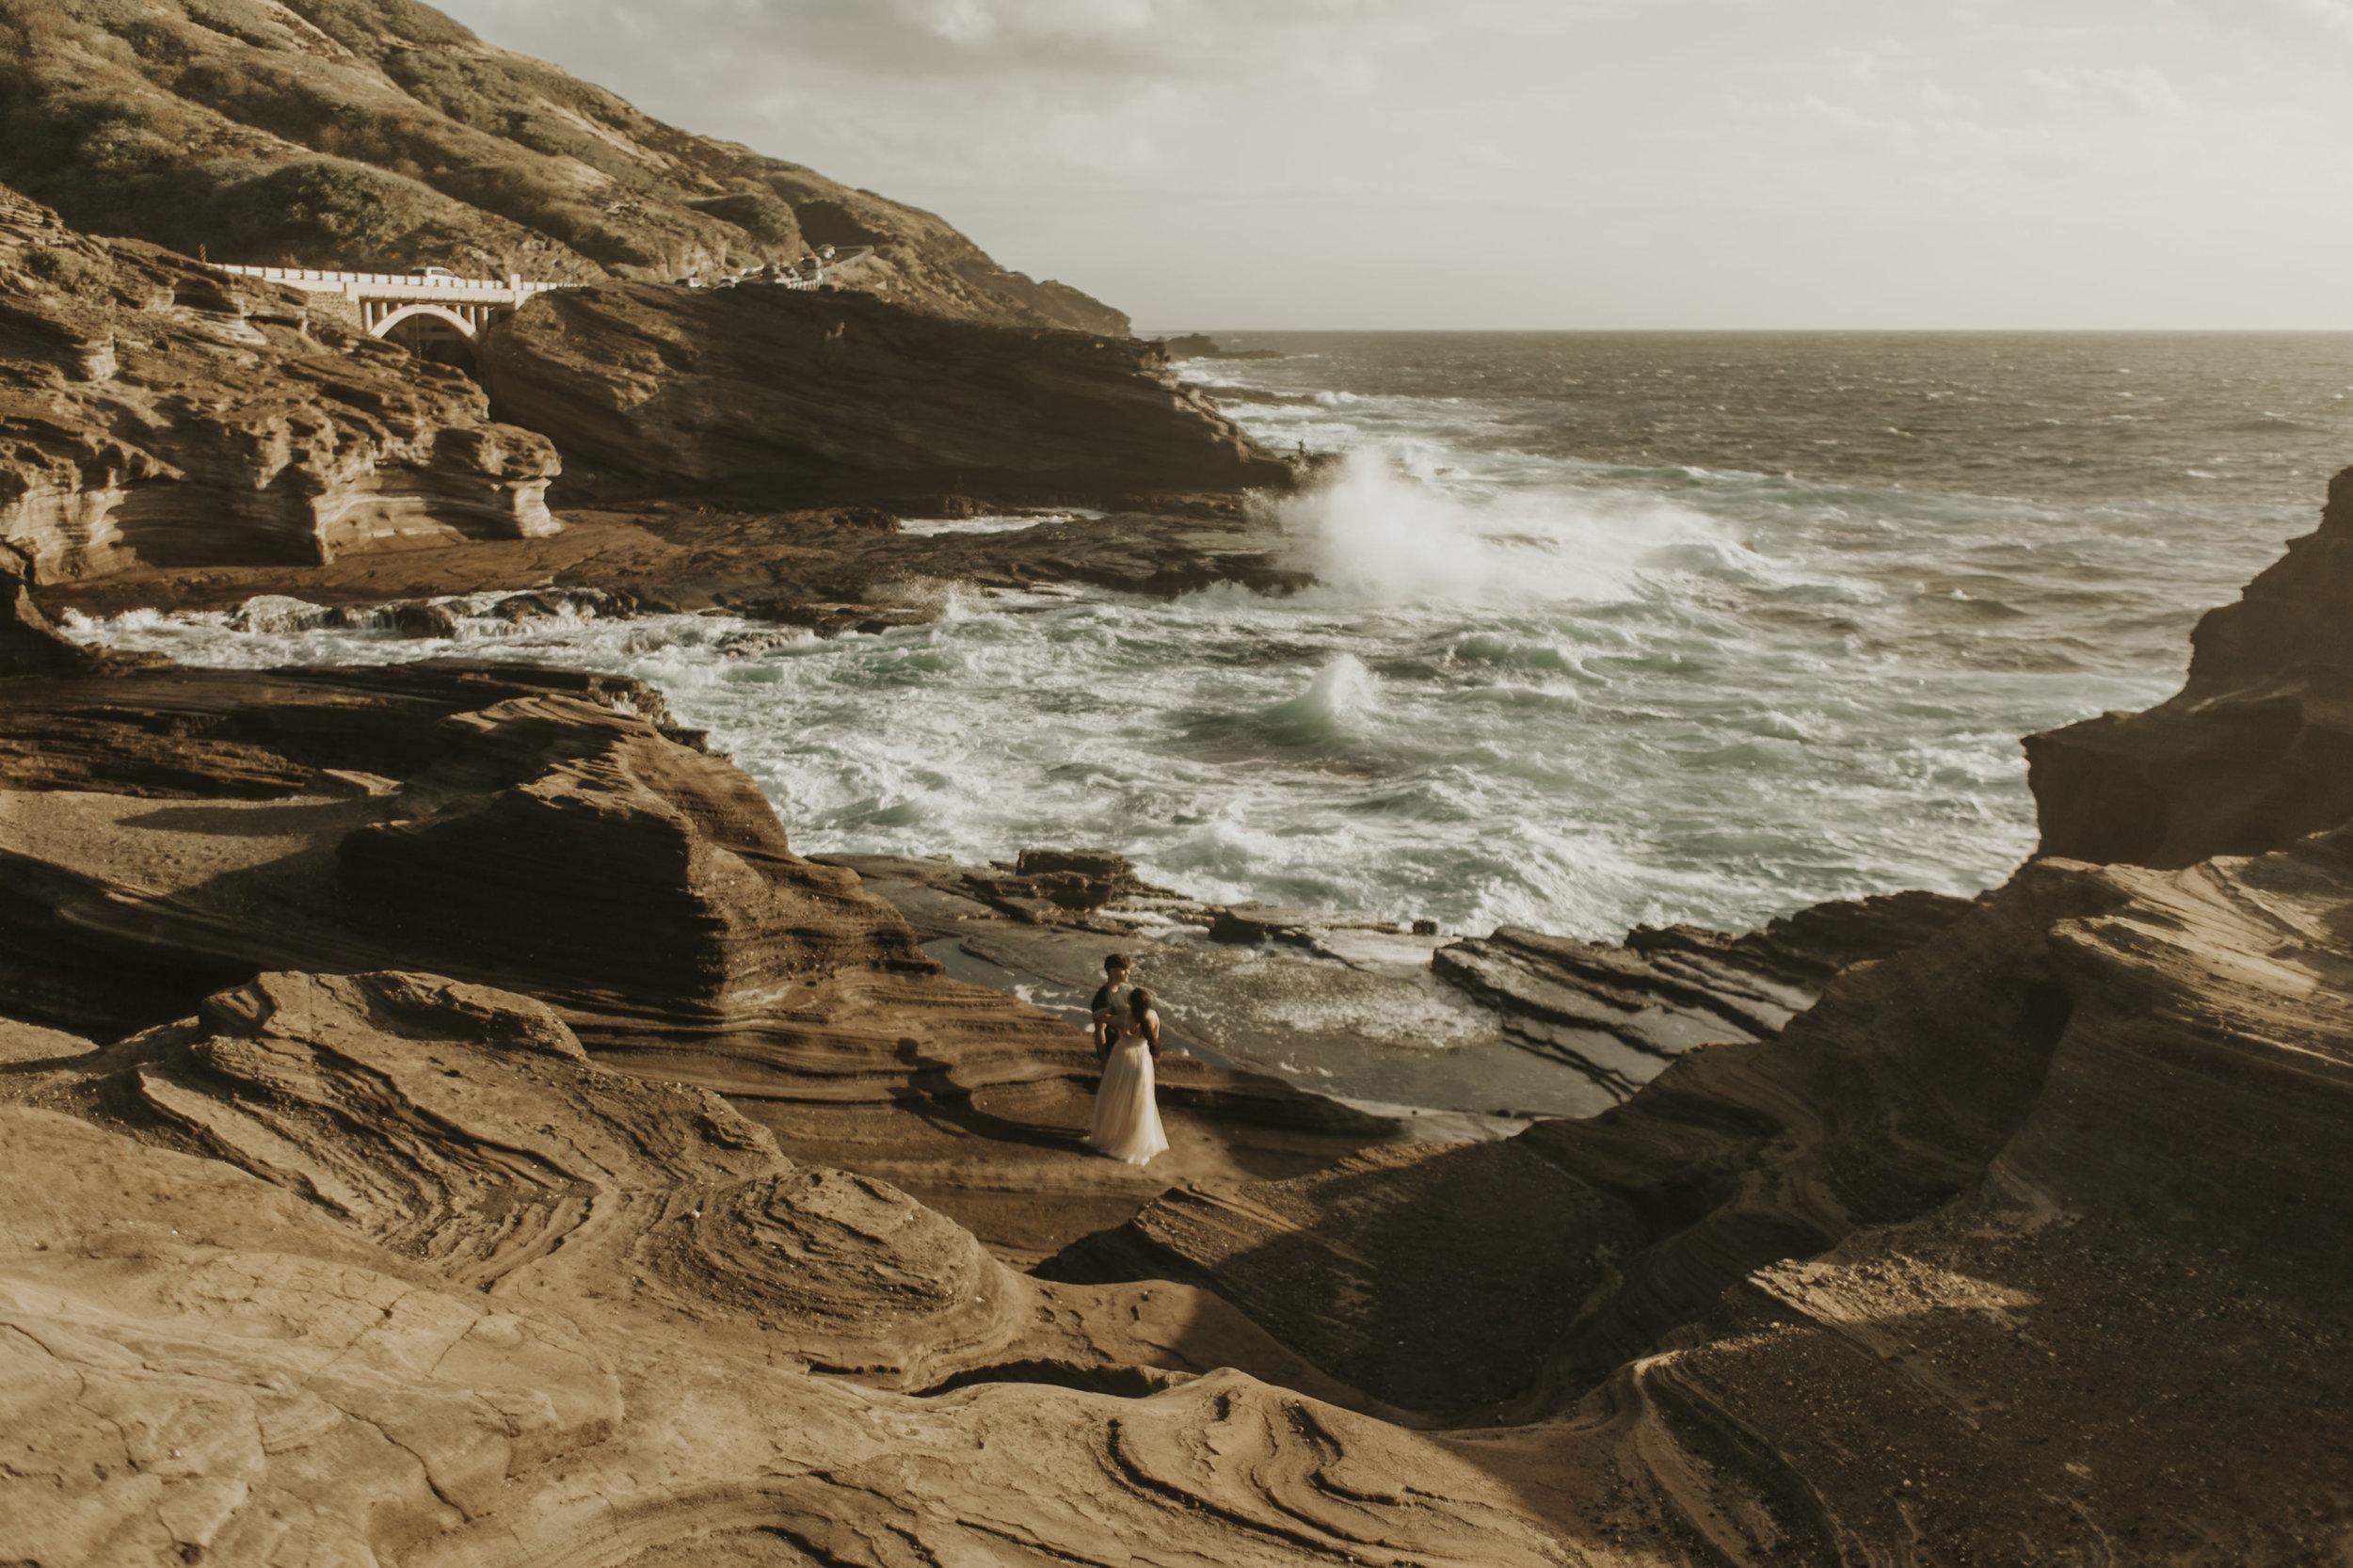 East Coast Of Oahu at Sunrise - Wedding Photography on Oahu, Hawaii